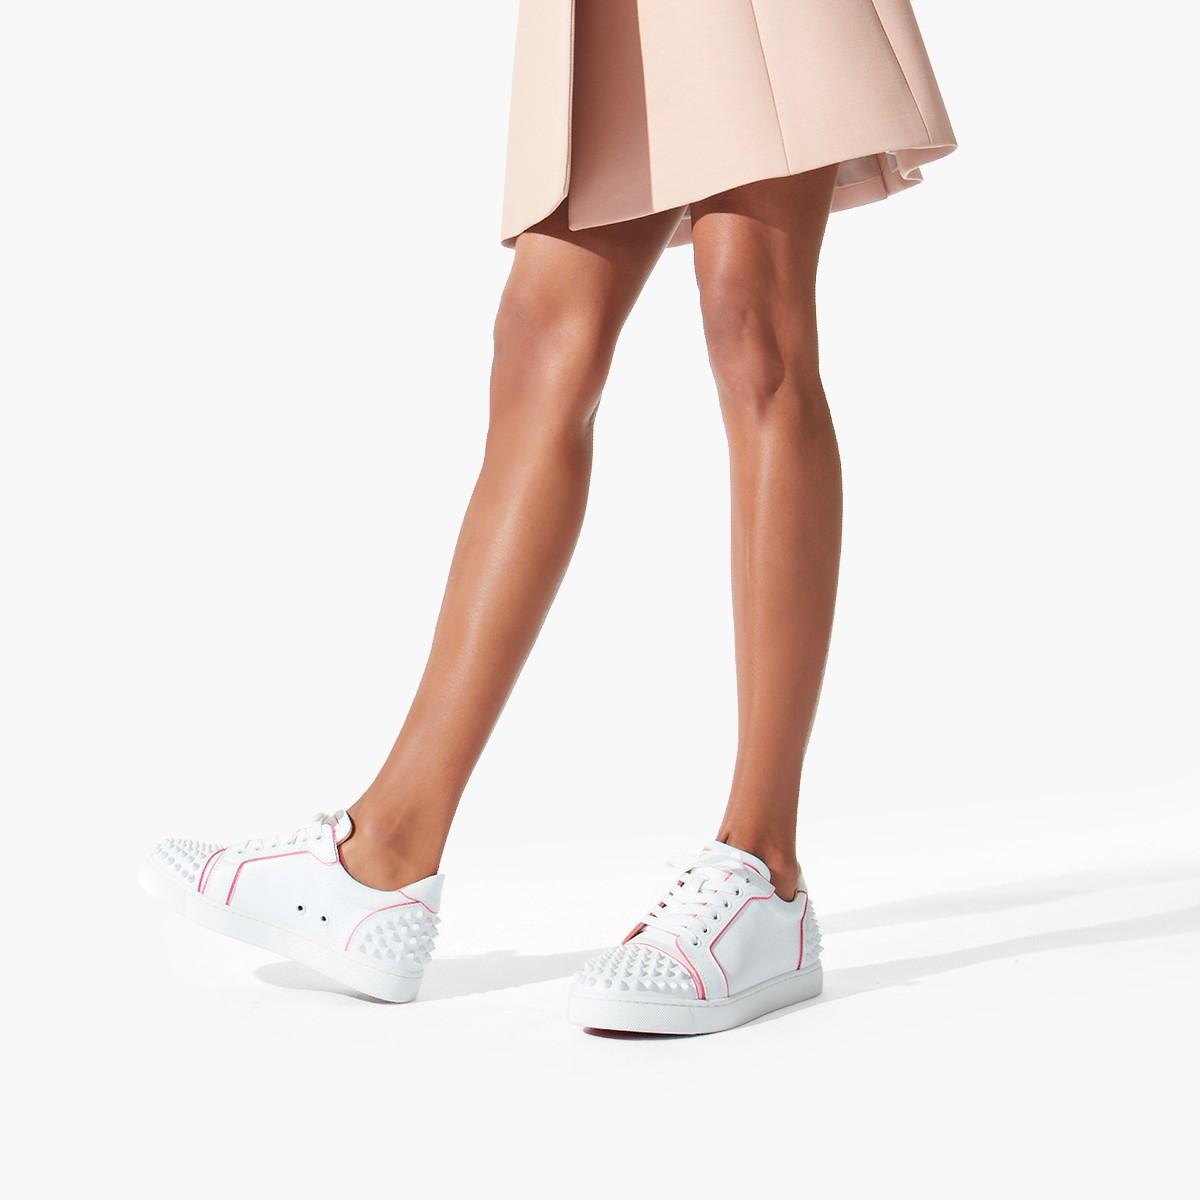 Shoes - Vieira 2 Flat - Christian Louboutin